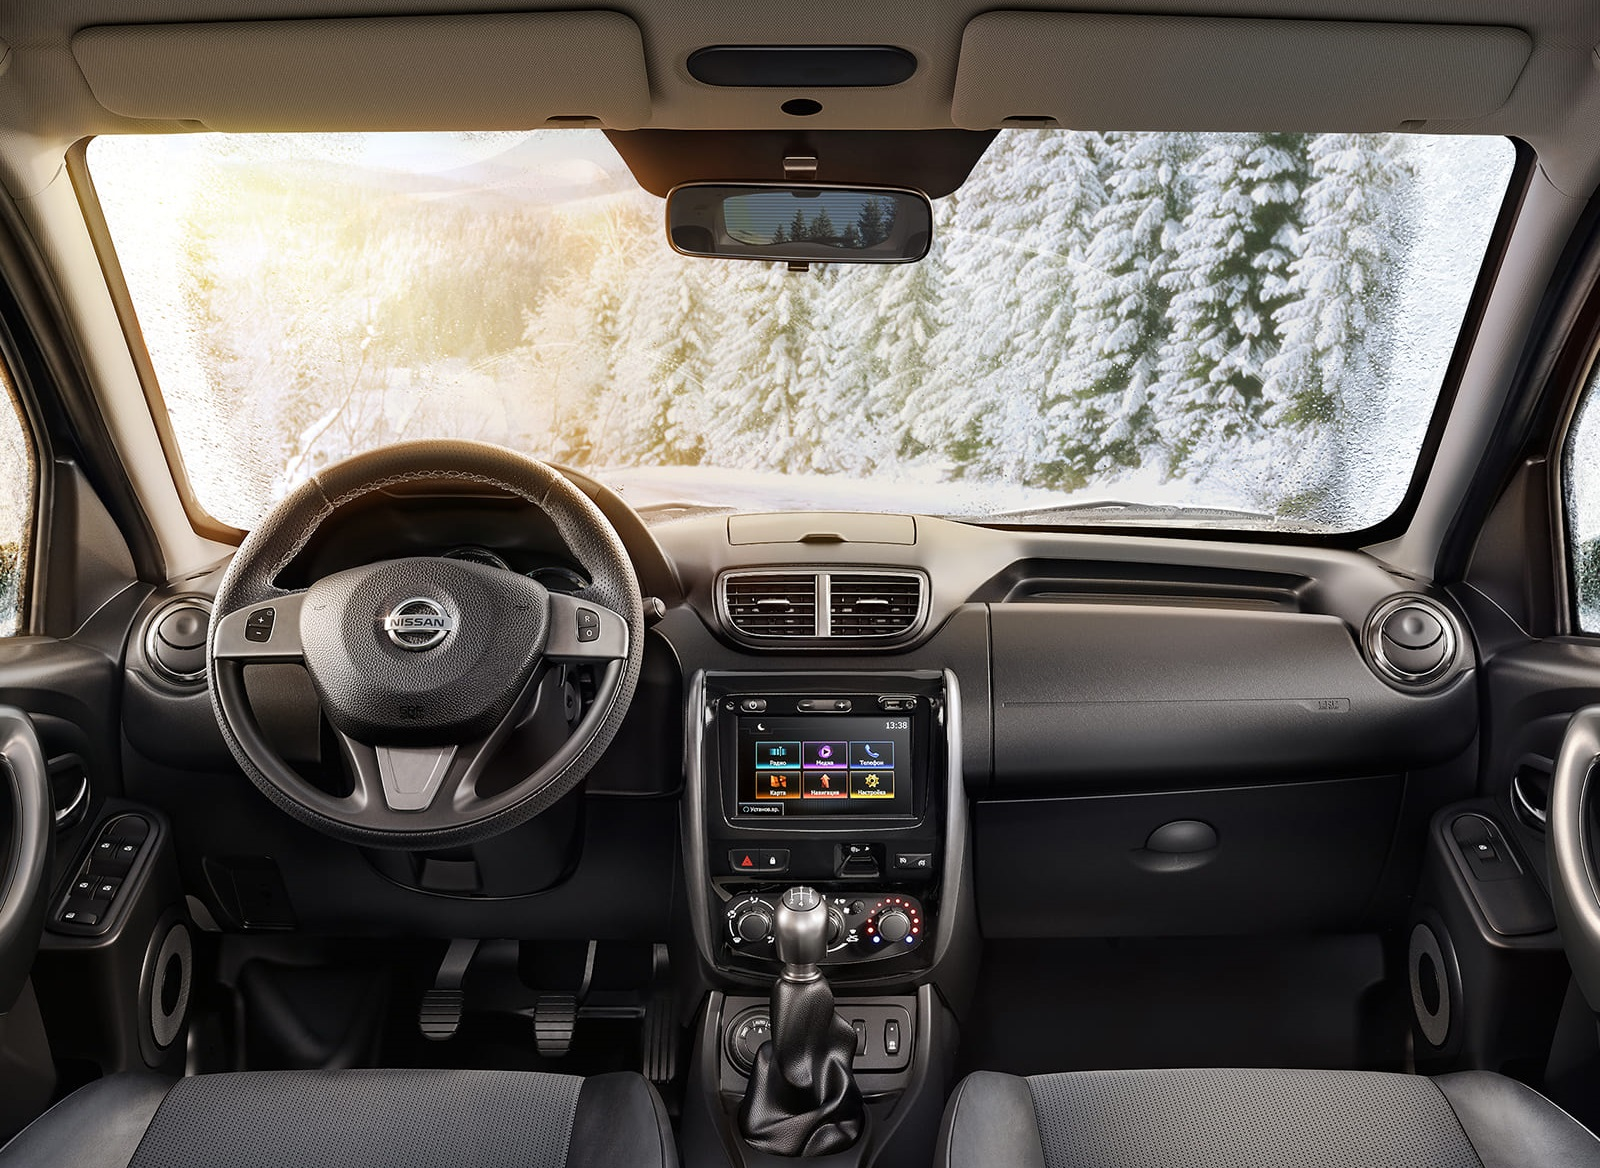 Nissan Terrano 2019 салон фото